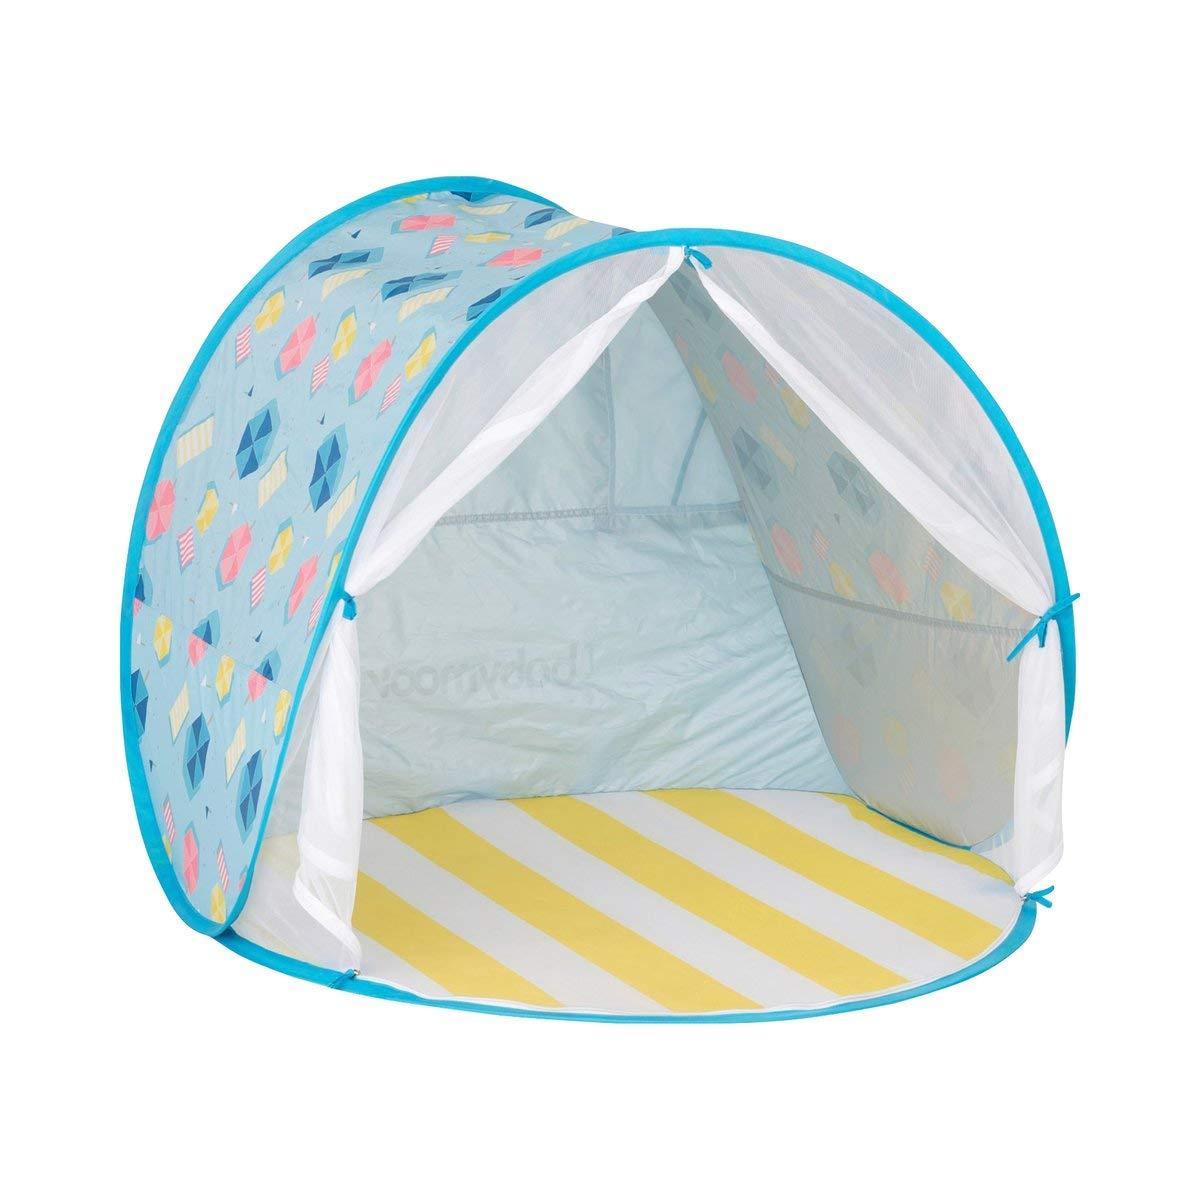 Babymoov Tente de plage avec protection UV, bleu ciel/multicolore